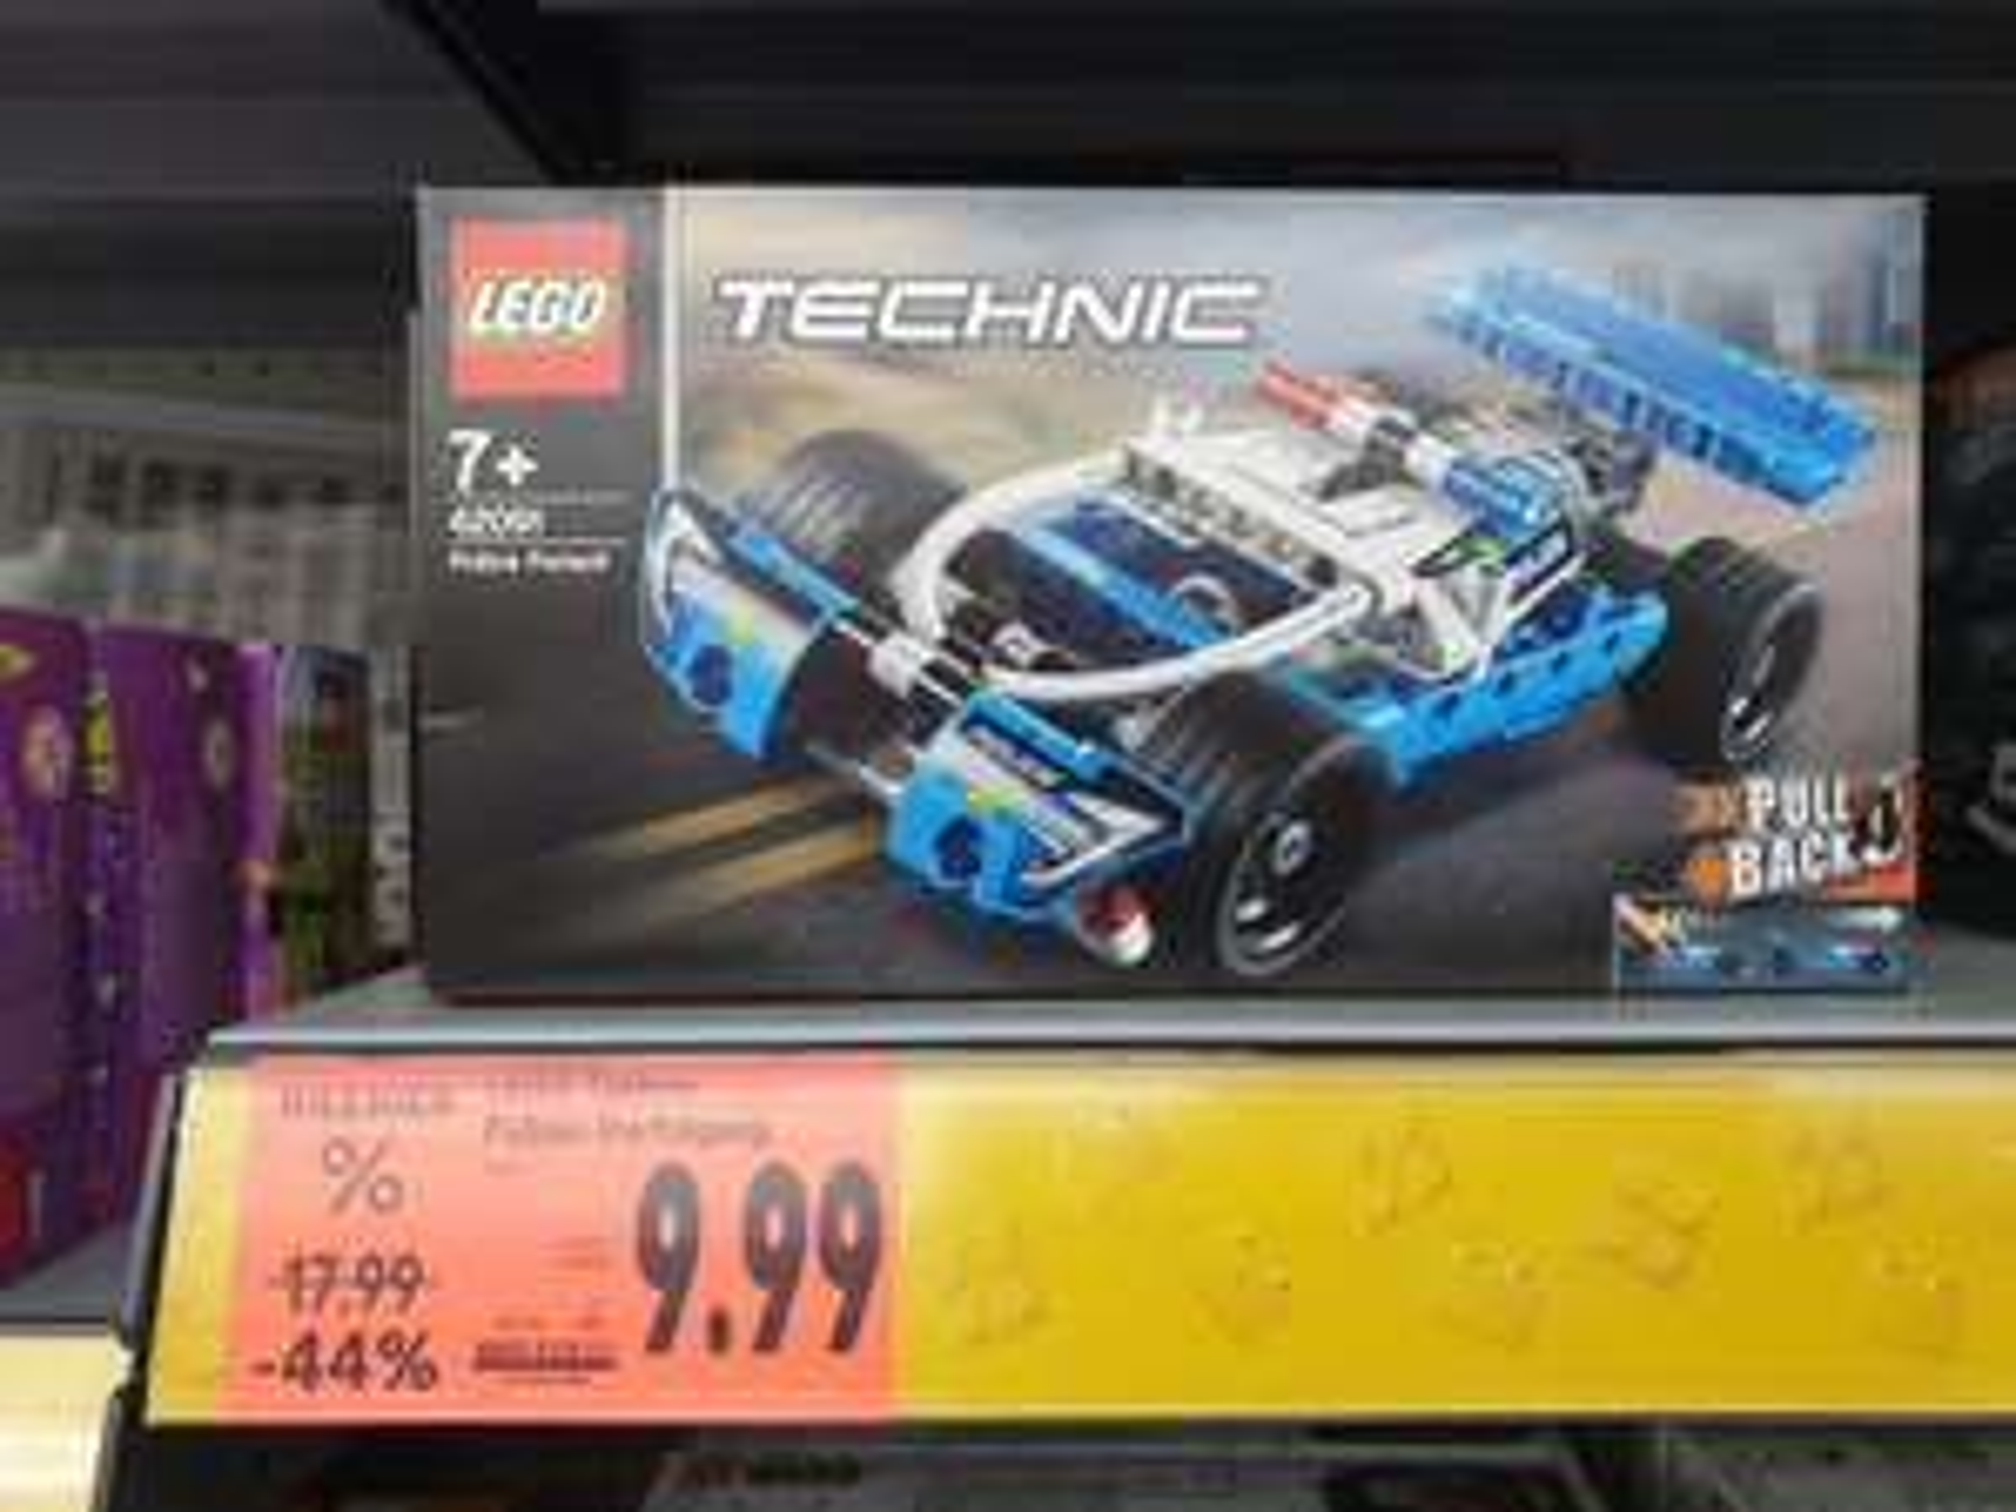 Lokal Erlangen Handelshof - Lego 42091 Technic Polizeiverfolgung